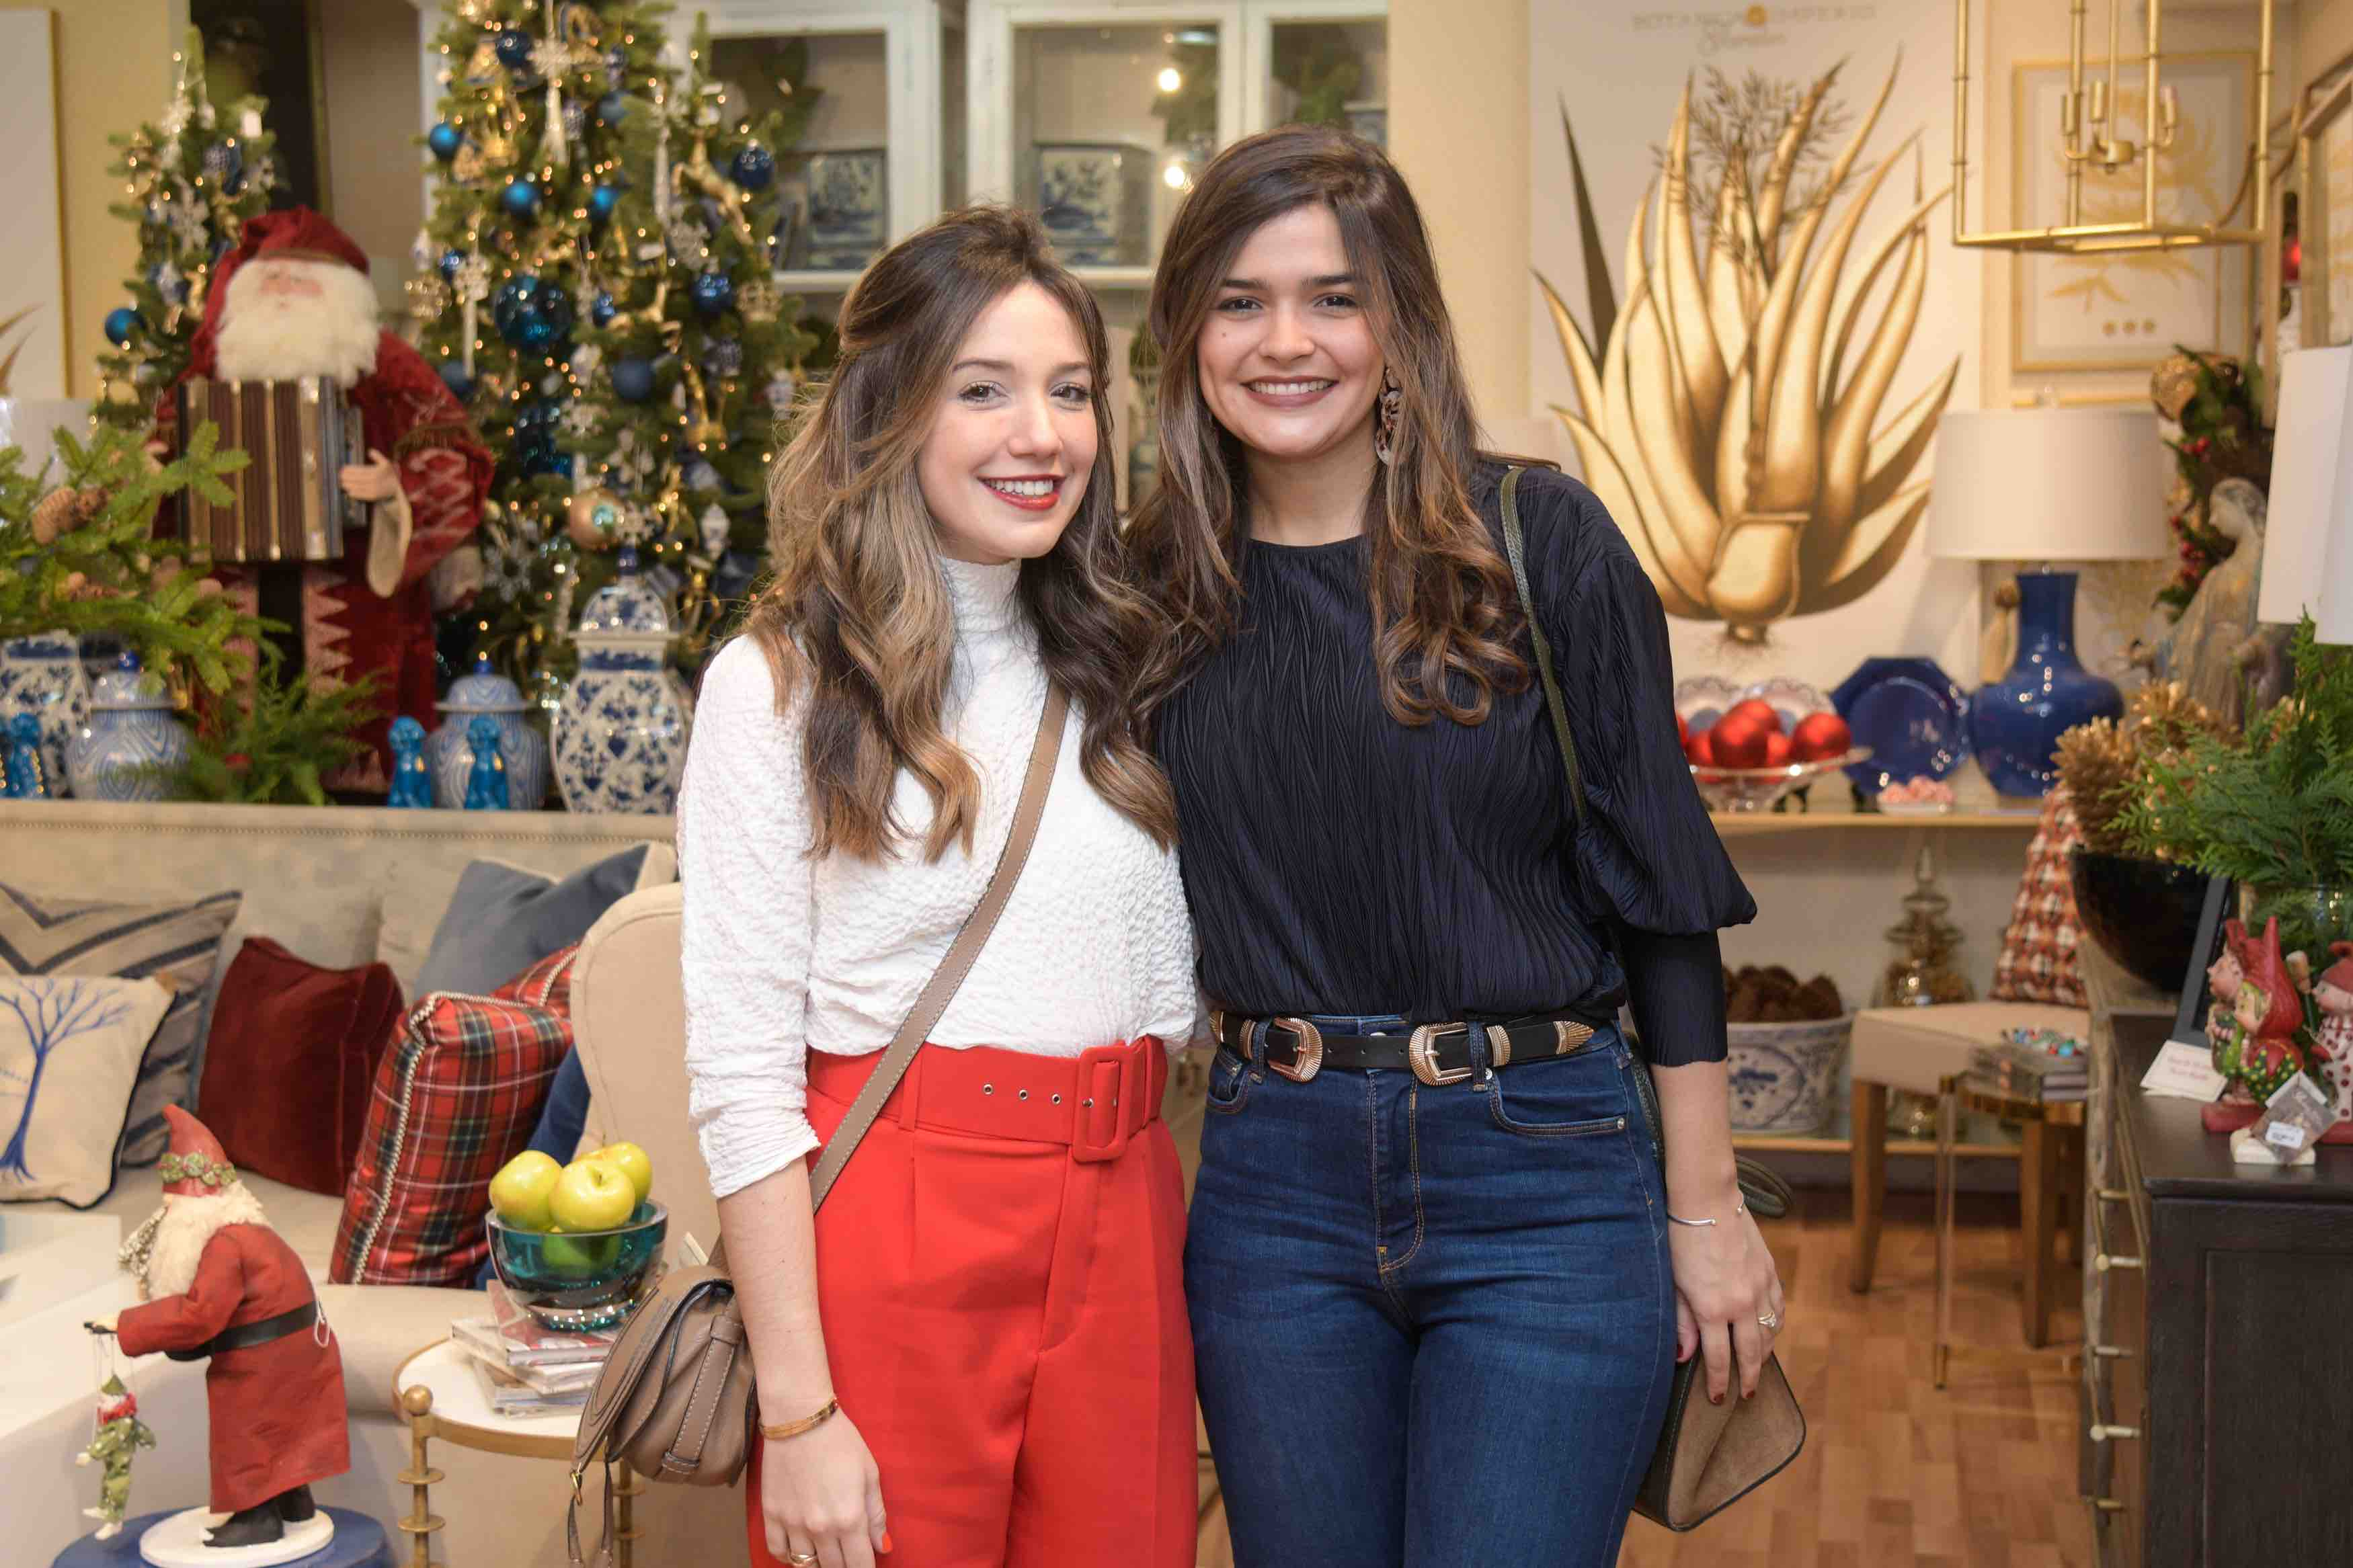 12.Gabriela Hernandez & Coral Chavez